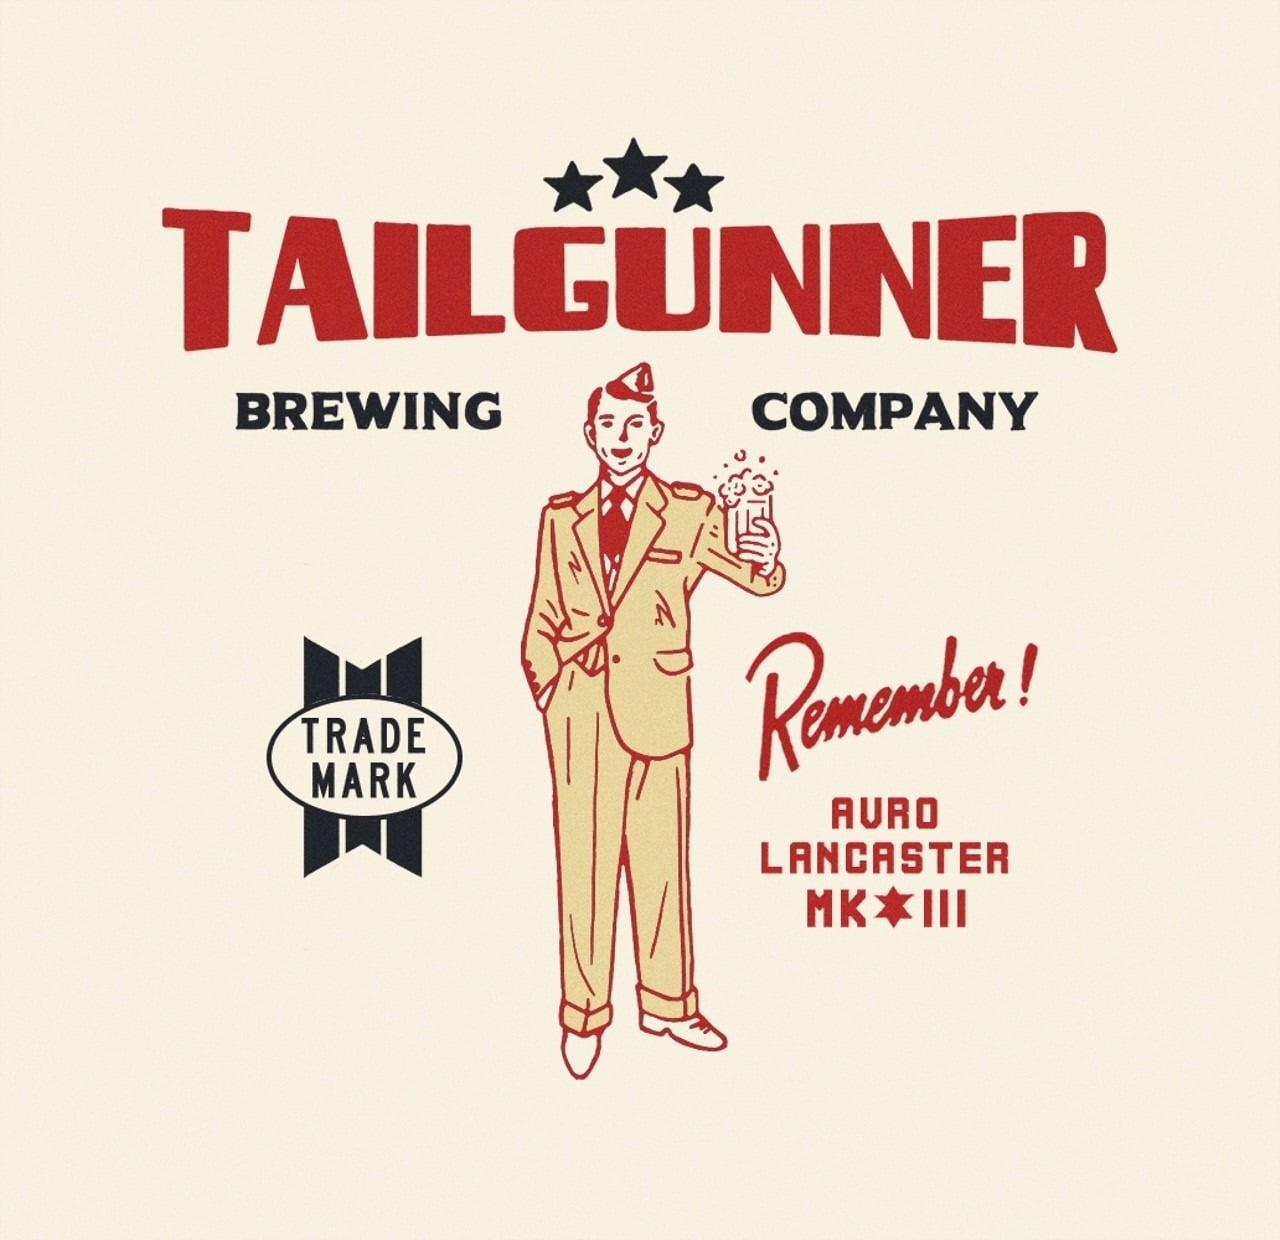 Tailgunner Brewing Co